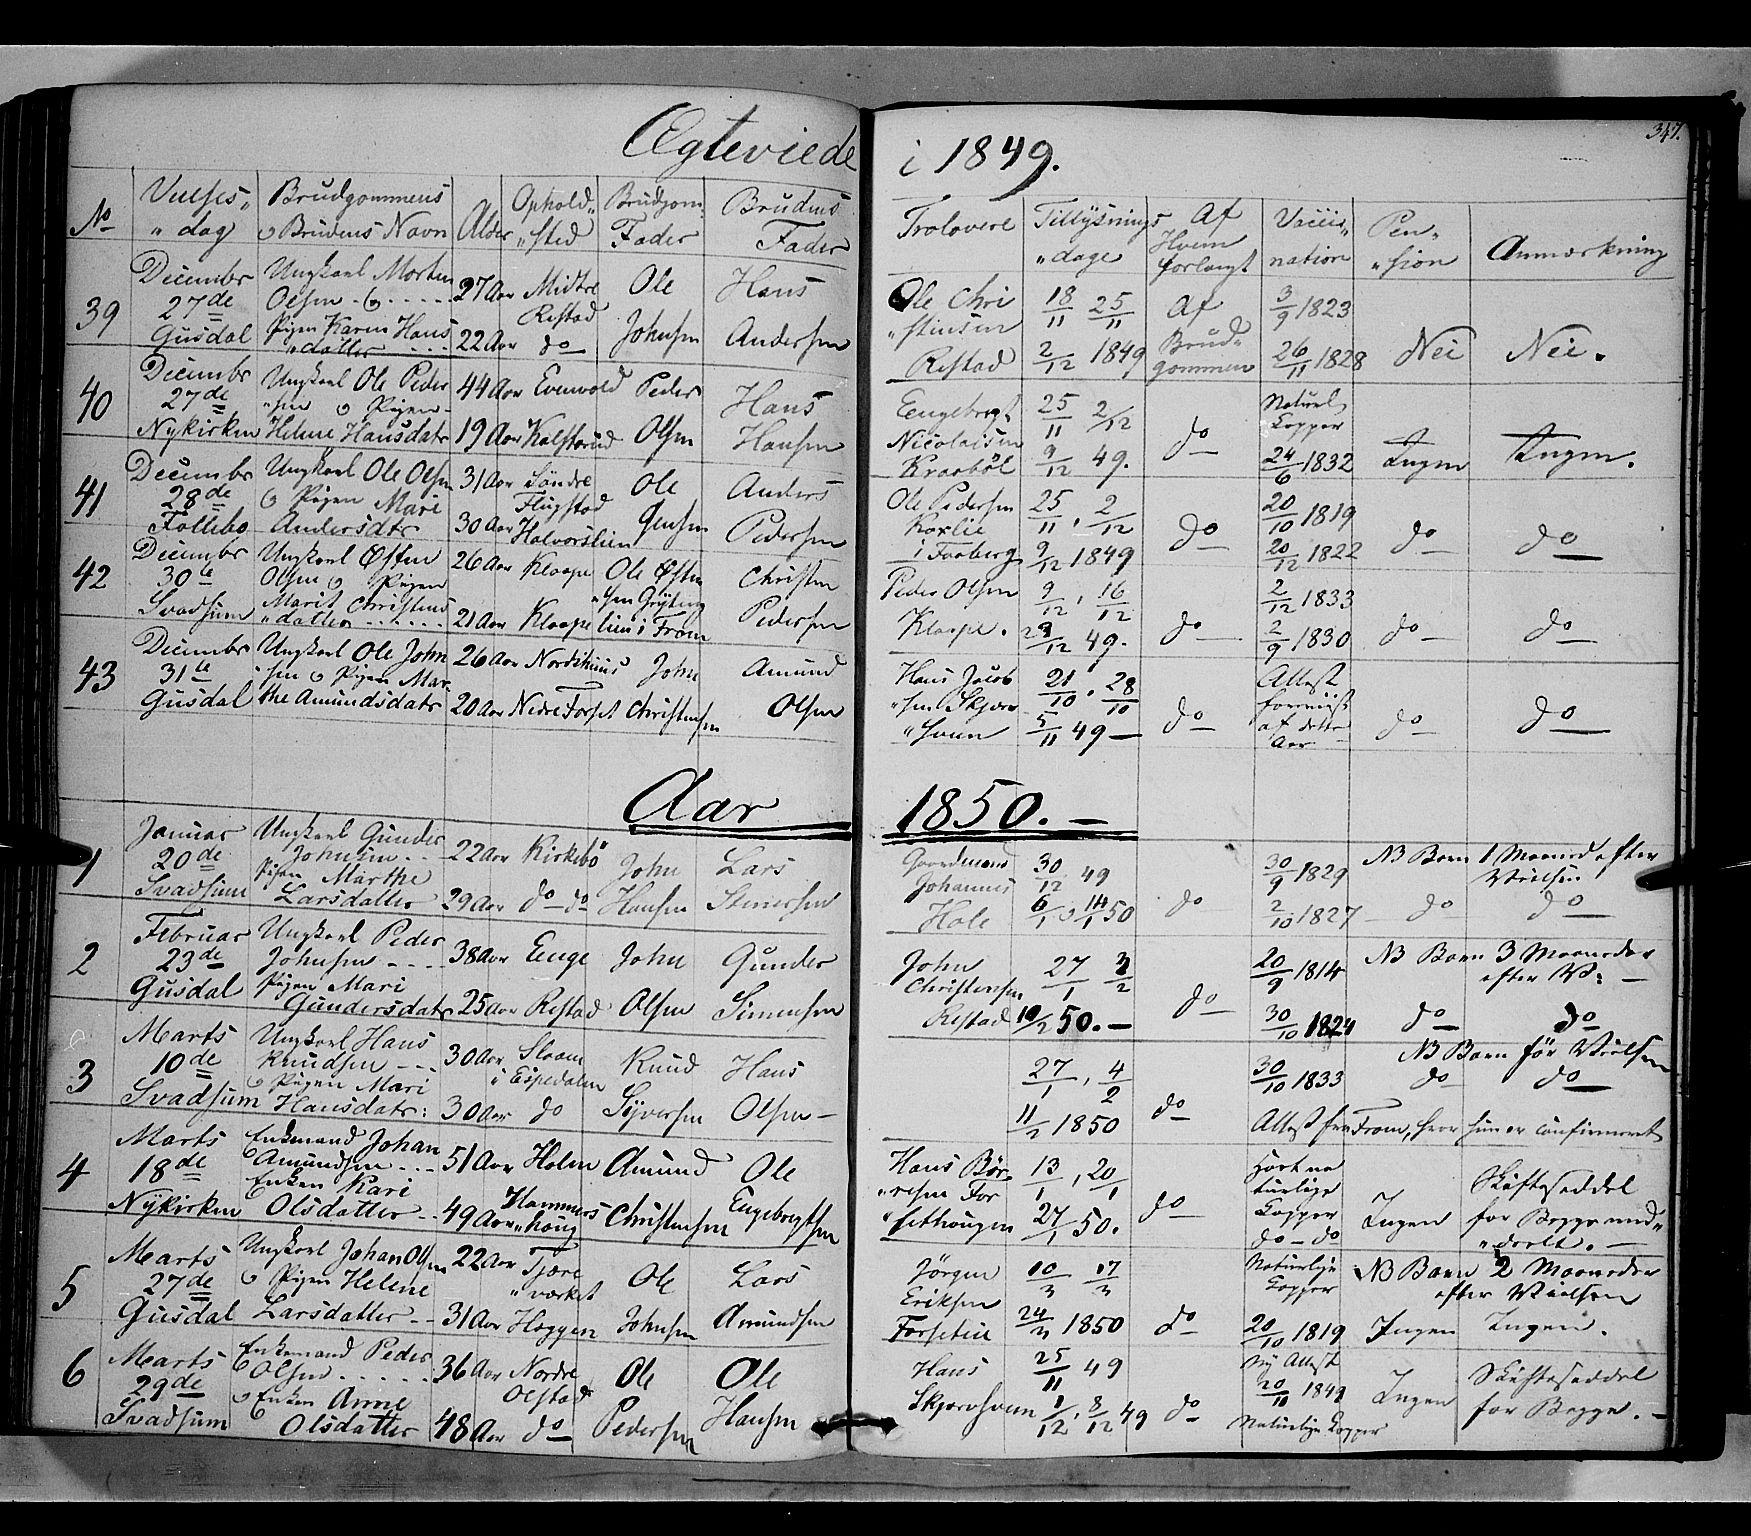 SAH, Gausdal prestekontor, Ministerialbok nr. 7, 1840-1850, s. 347